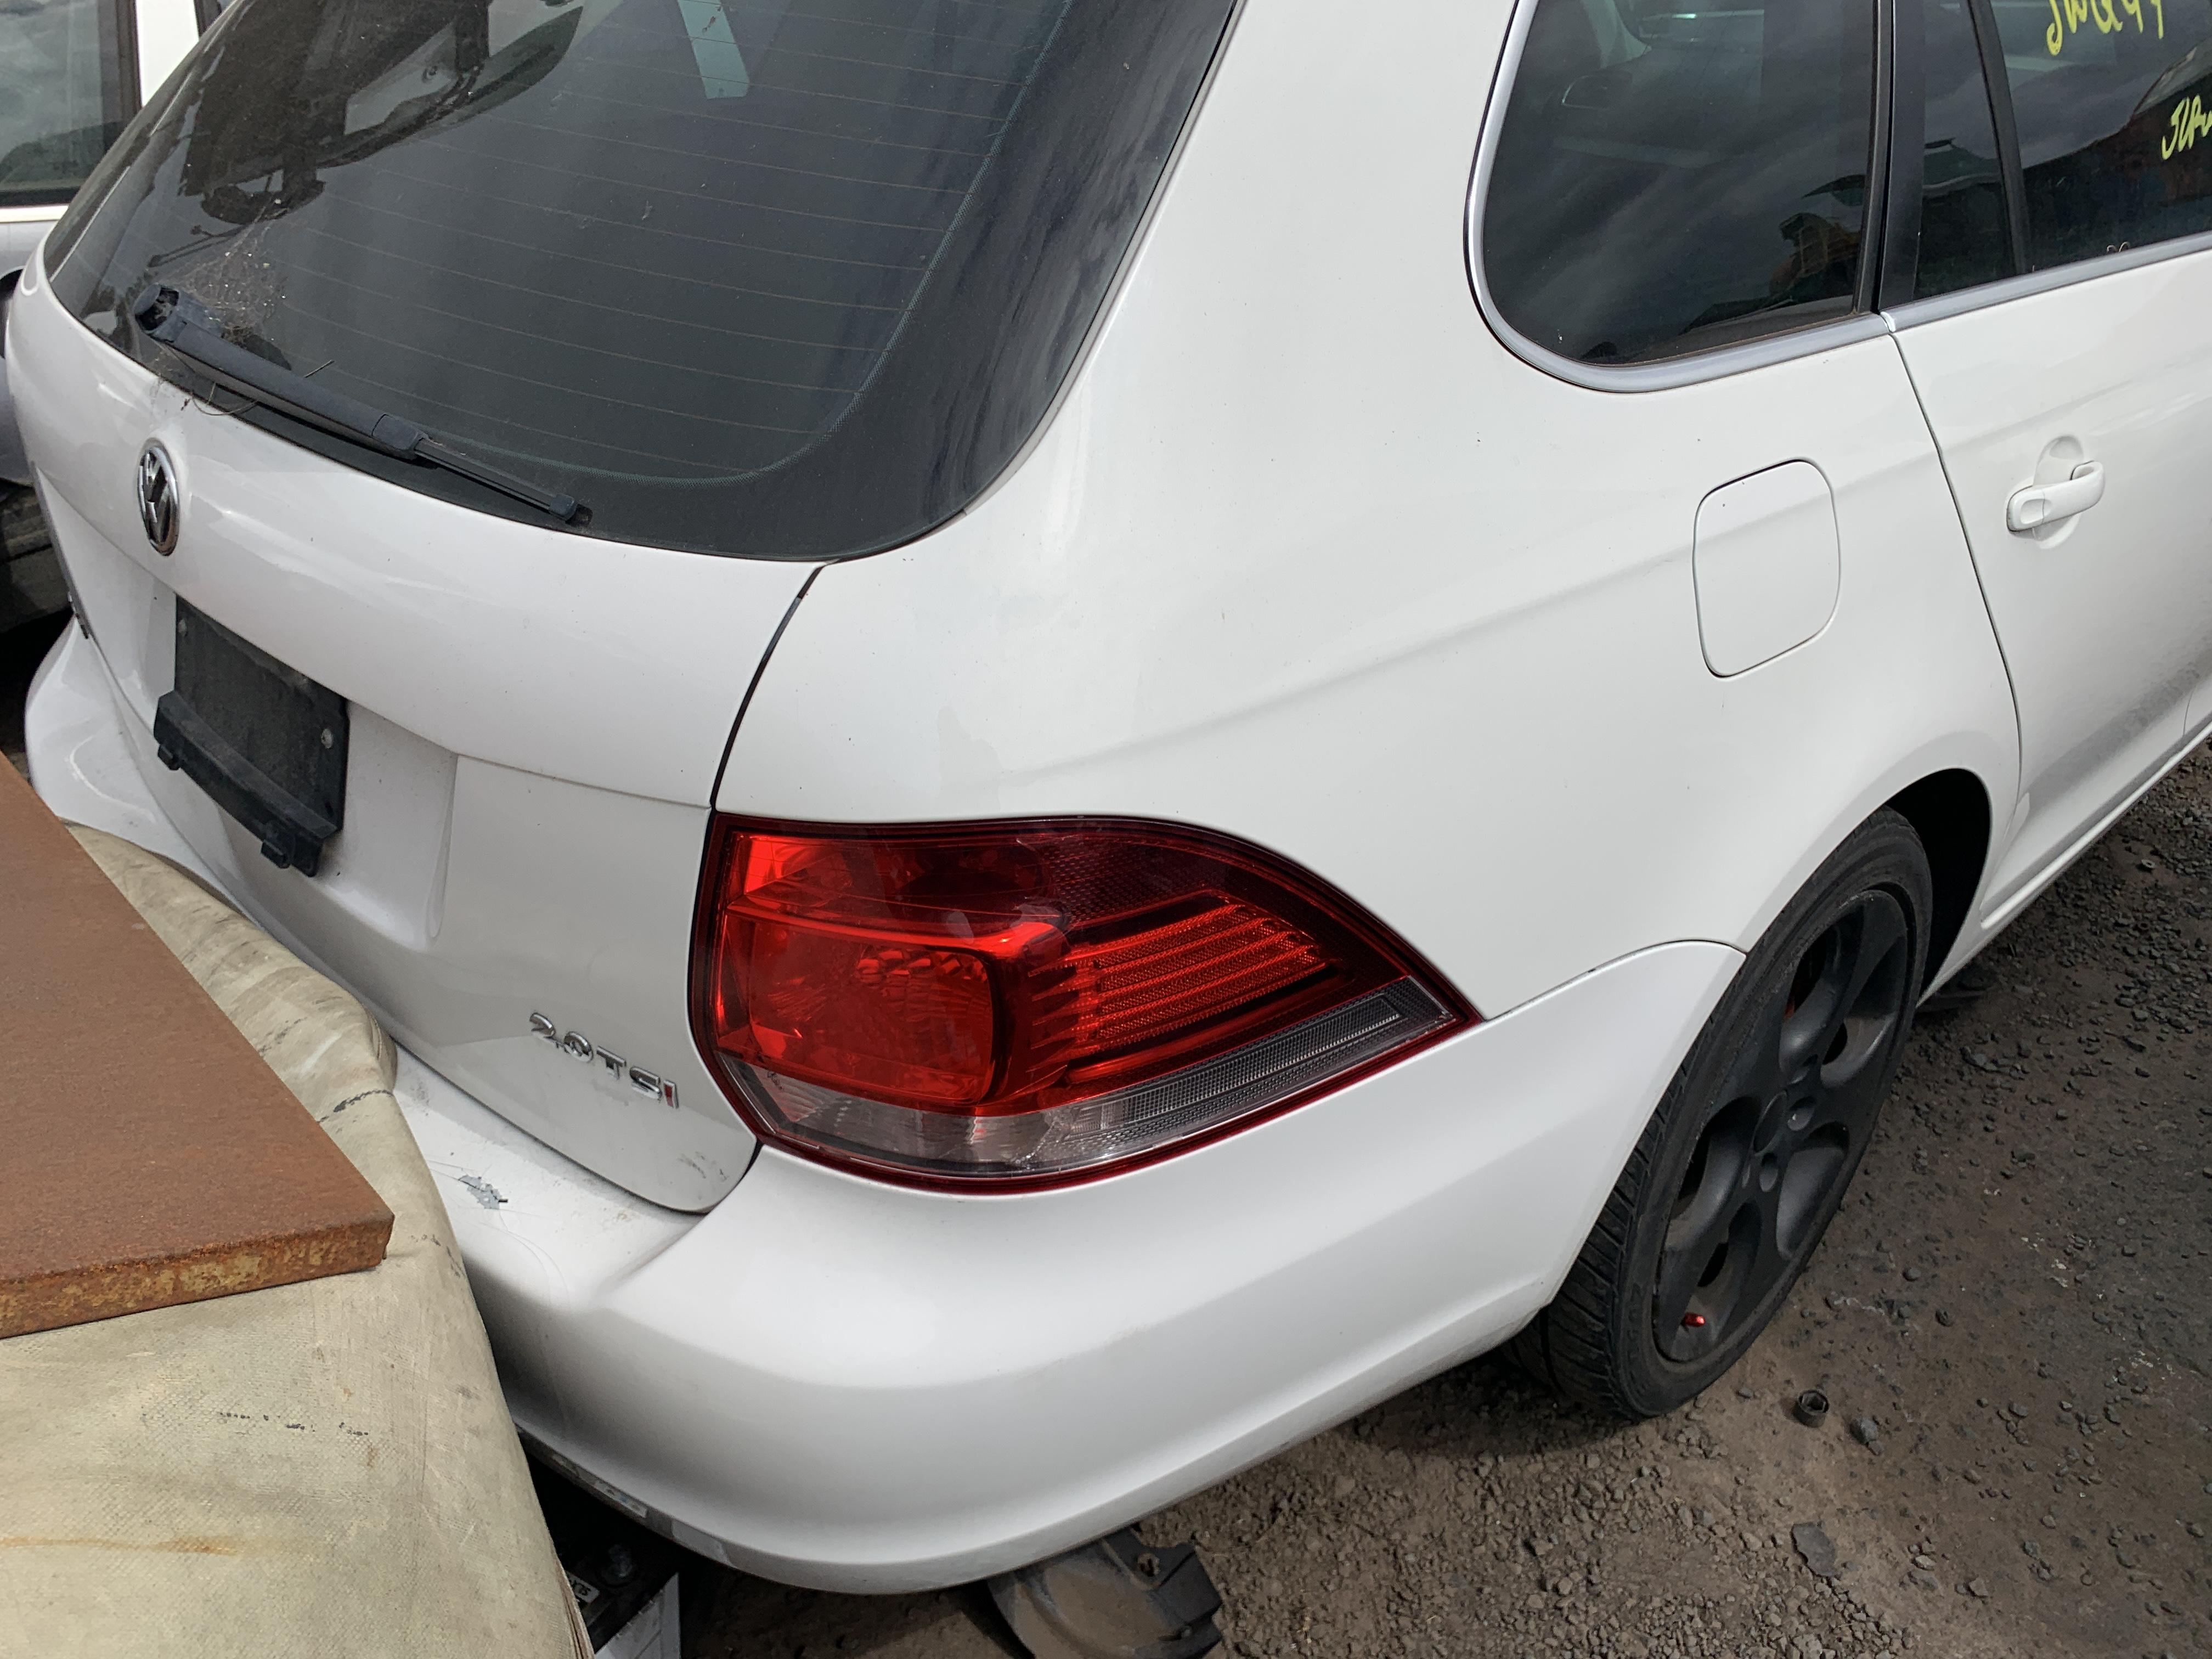 VW Golf 2010